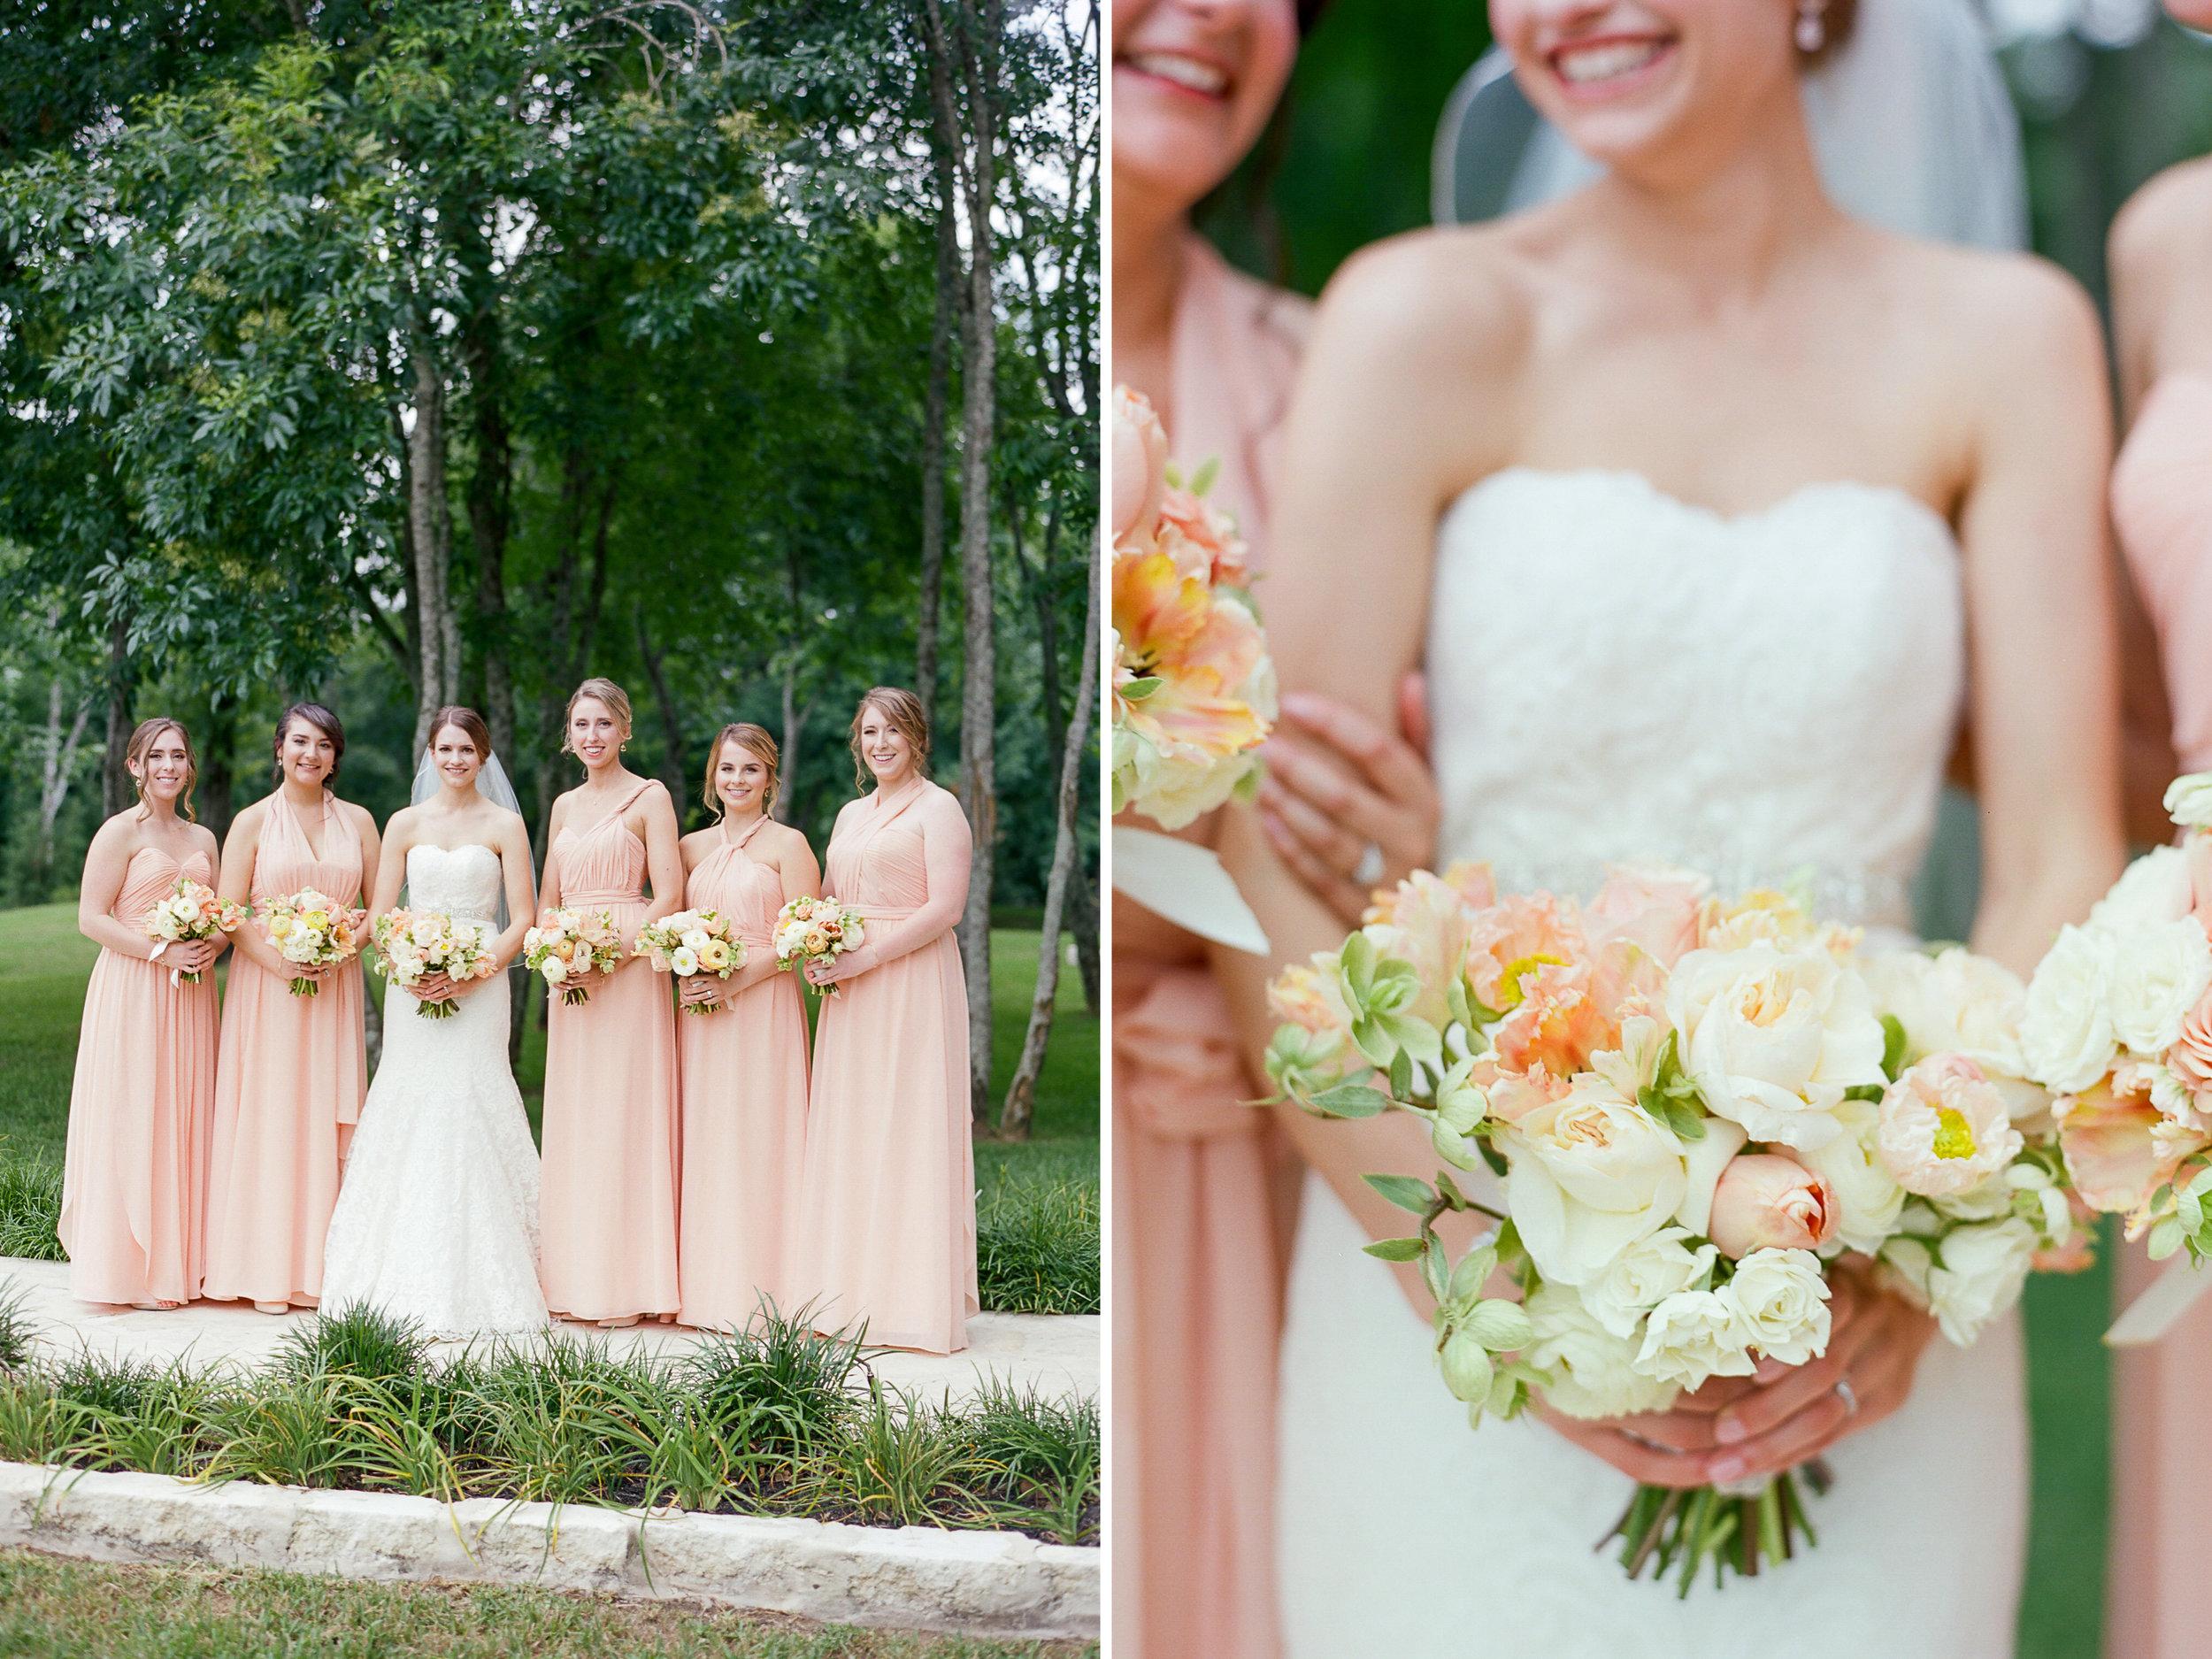 The-Knot-Wedding-Houston-Photographer-Fine-Art-Dana-Fernandez-Photography-Film-107.jpg